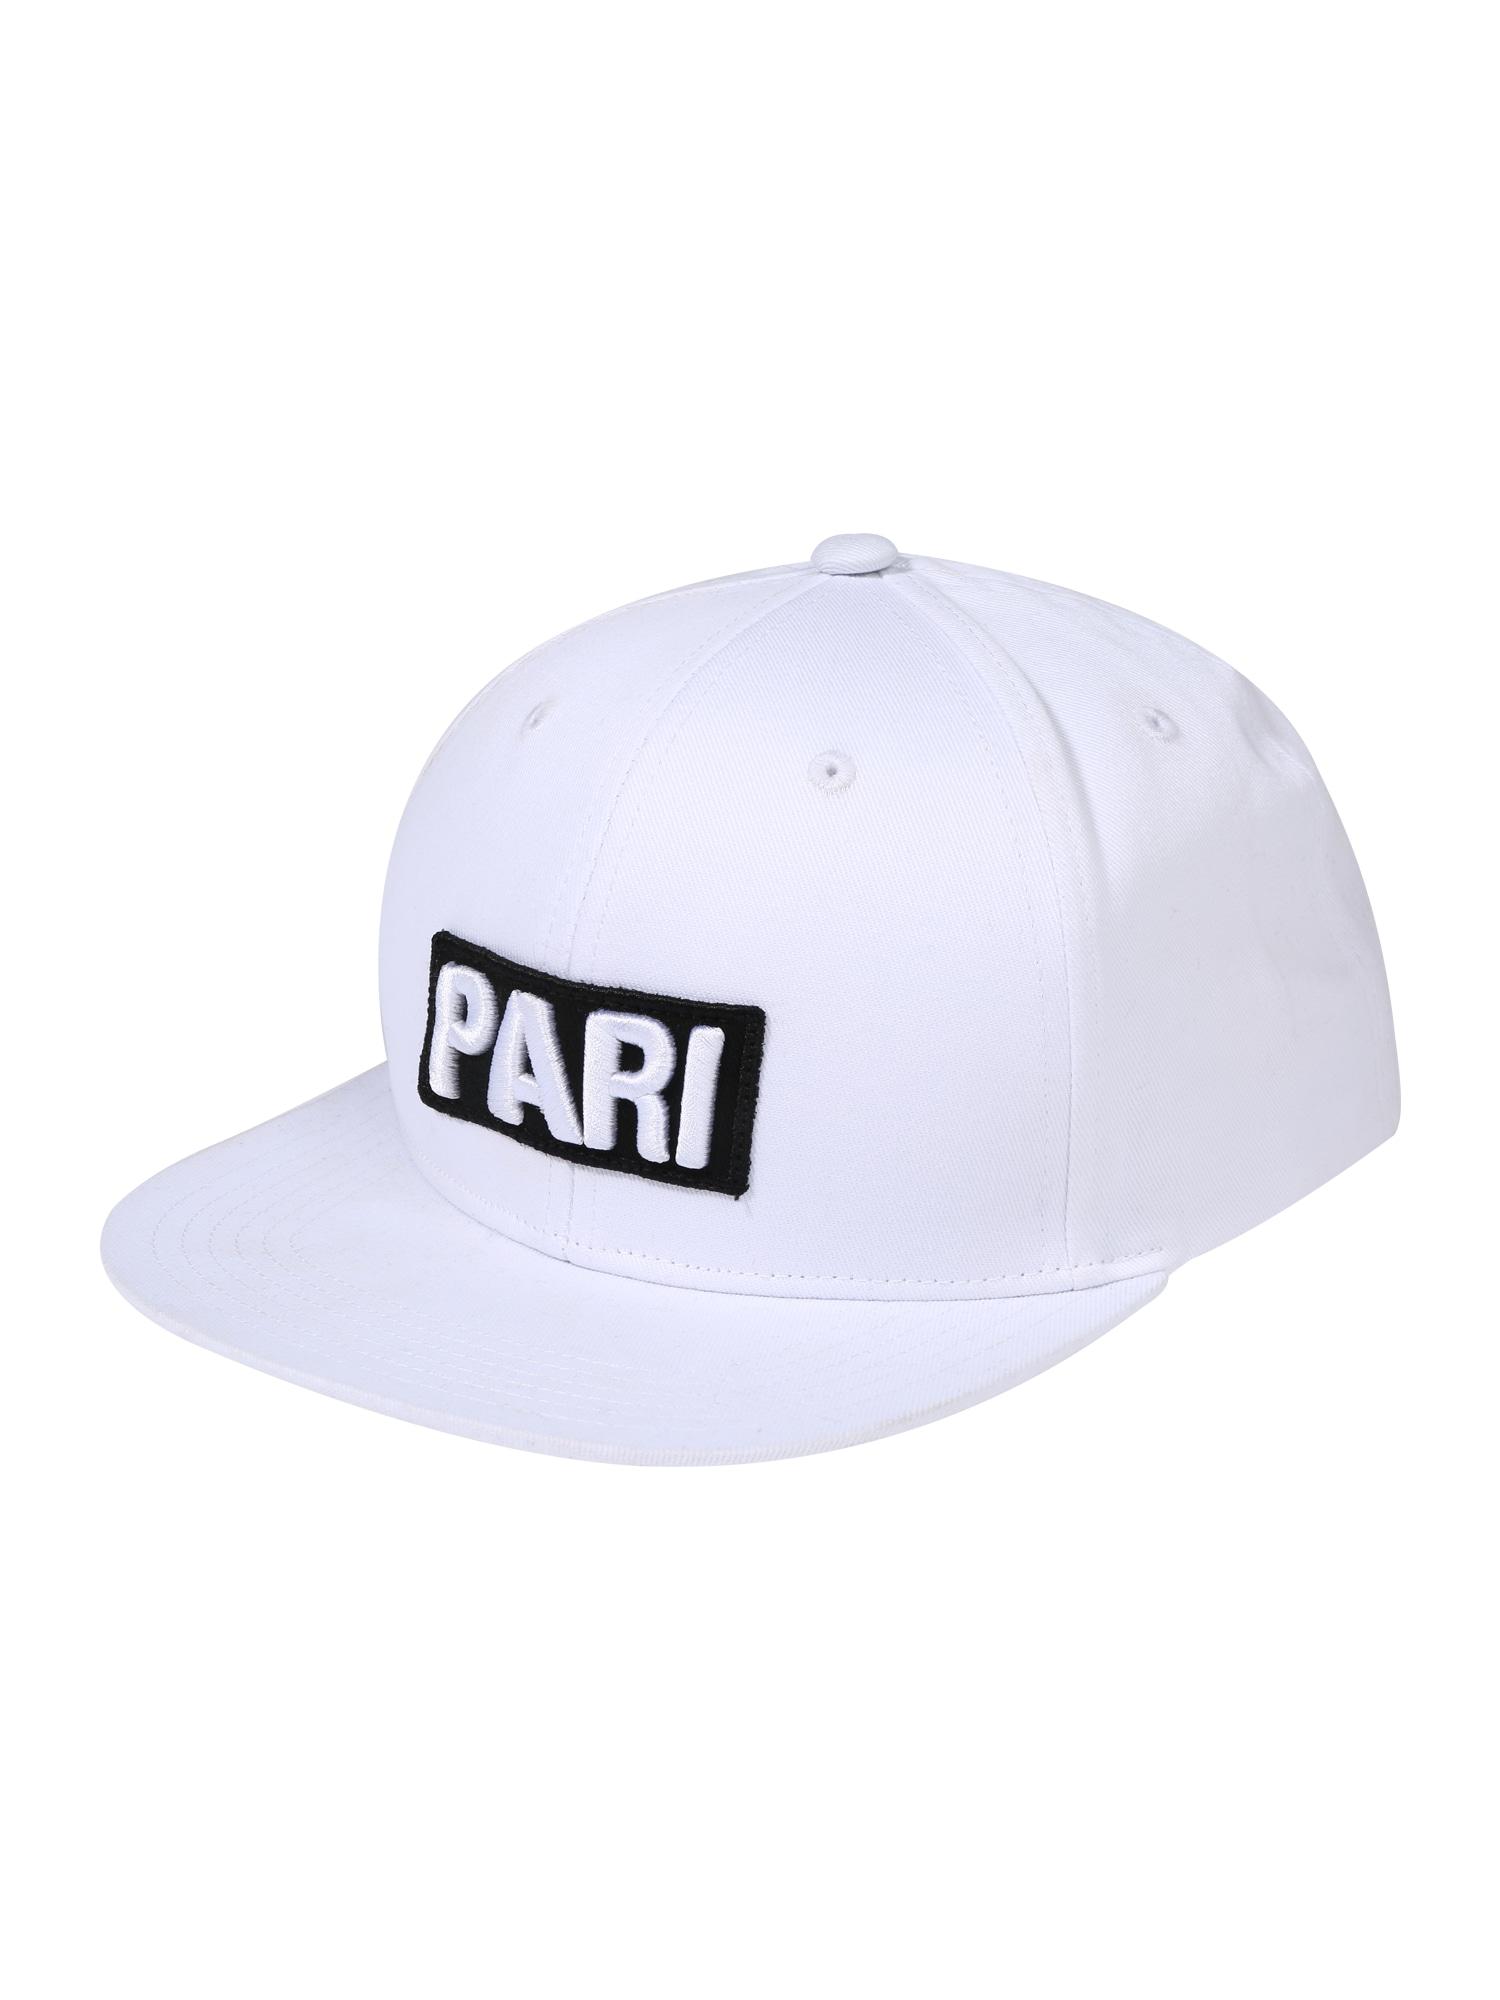 ABOUT YOU X PARI Kepurė 'Raul' balta